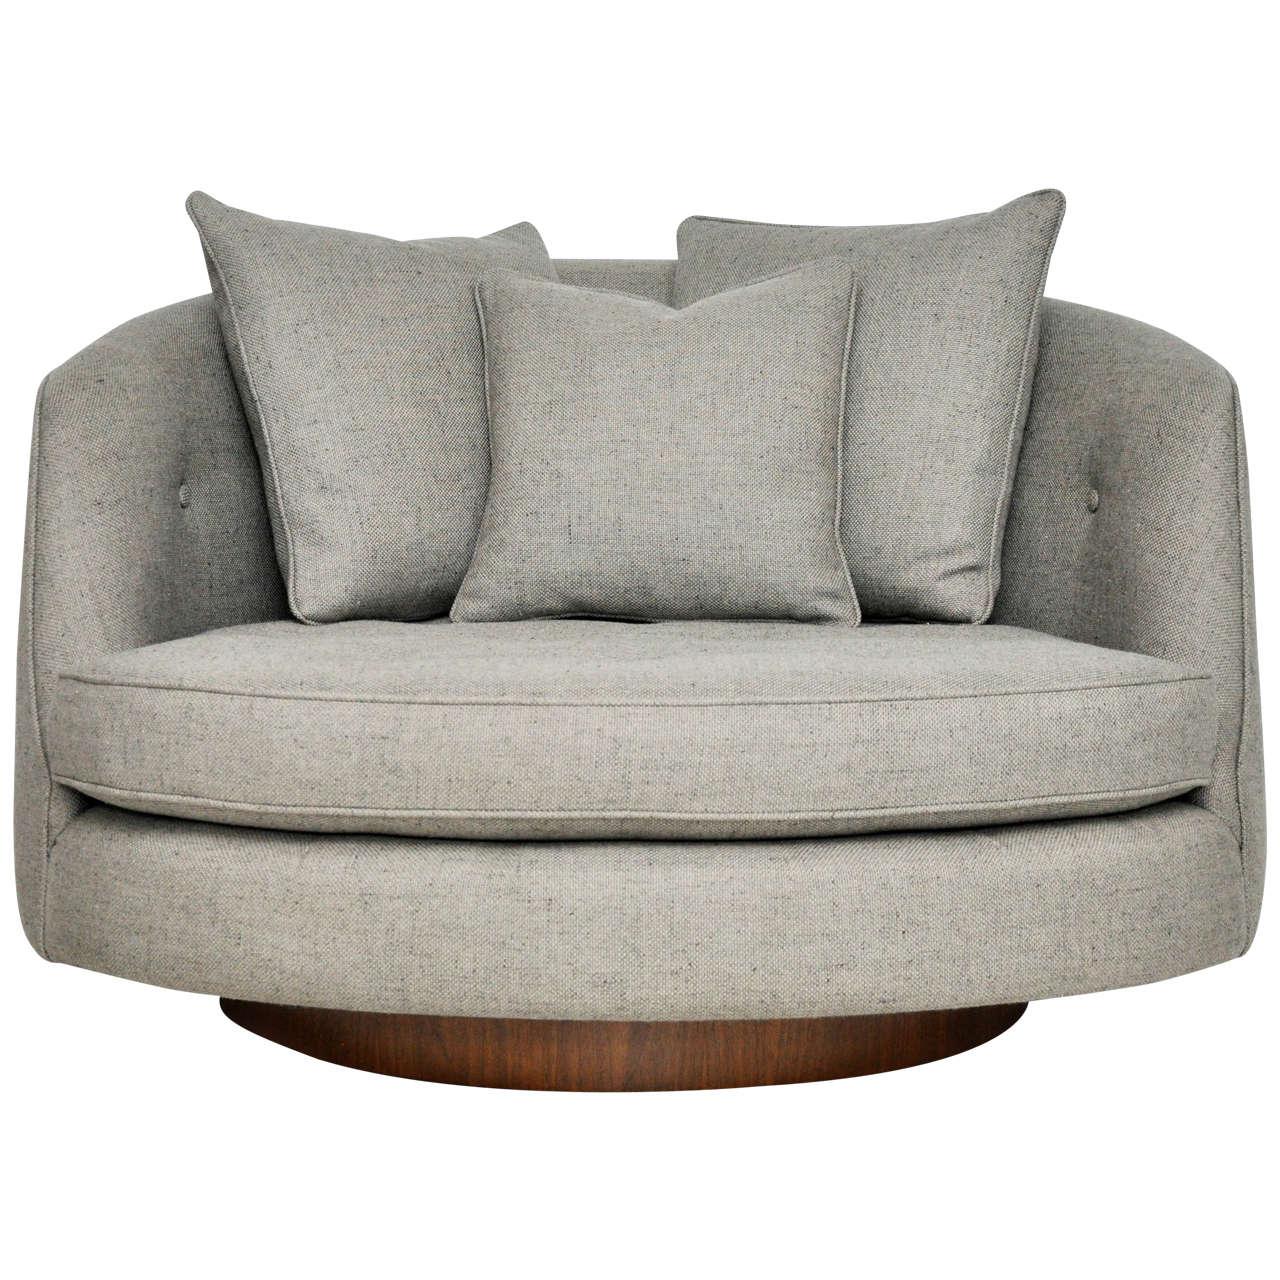 Milo Baughman Large Swivel Chair at 1stdibs